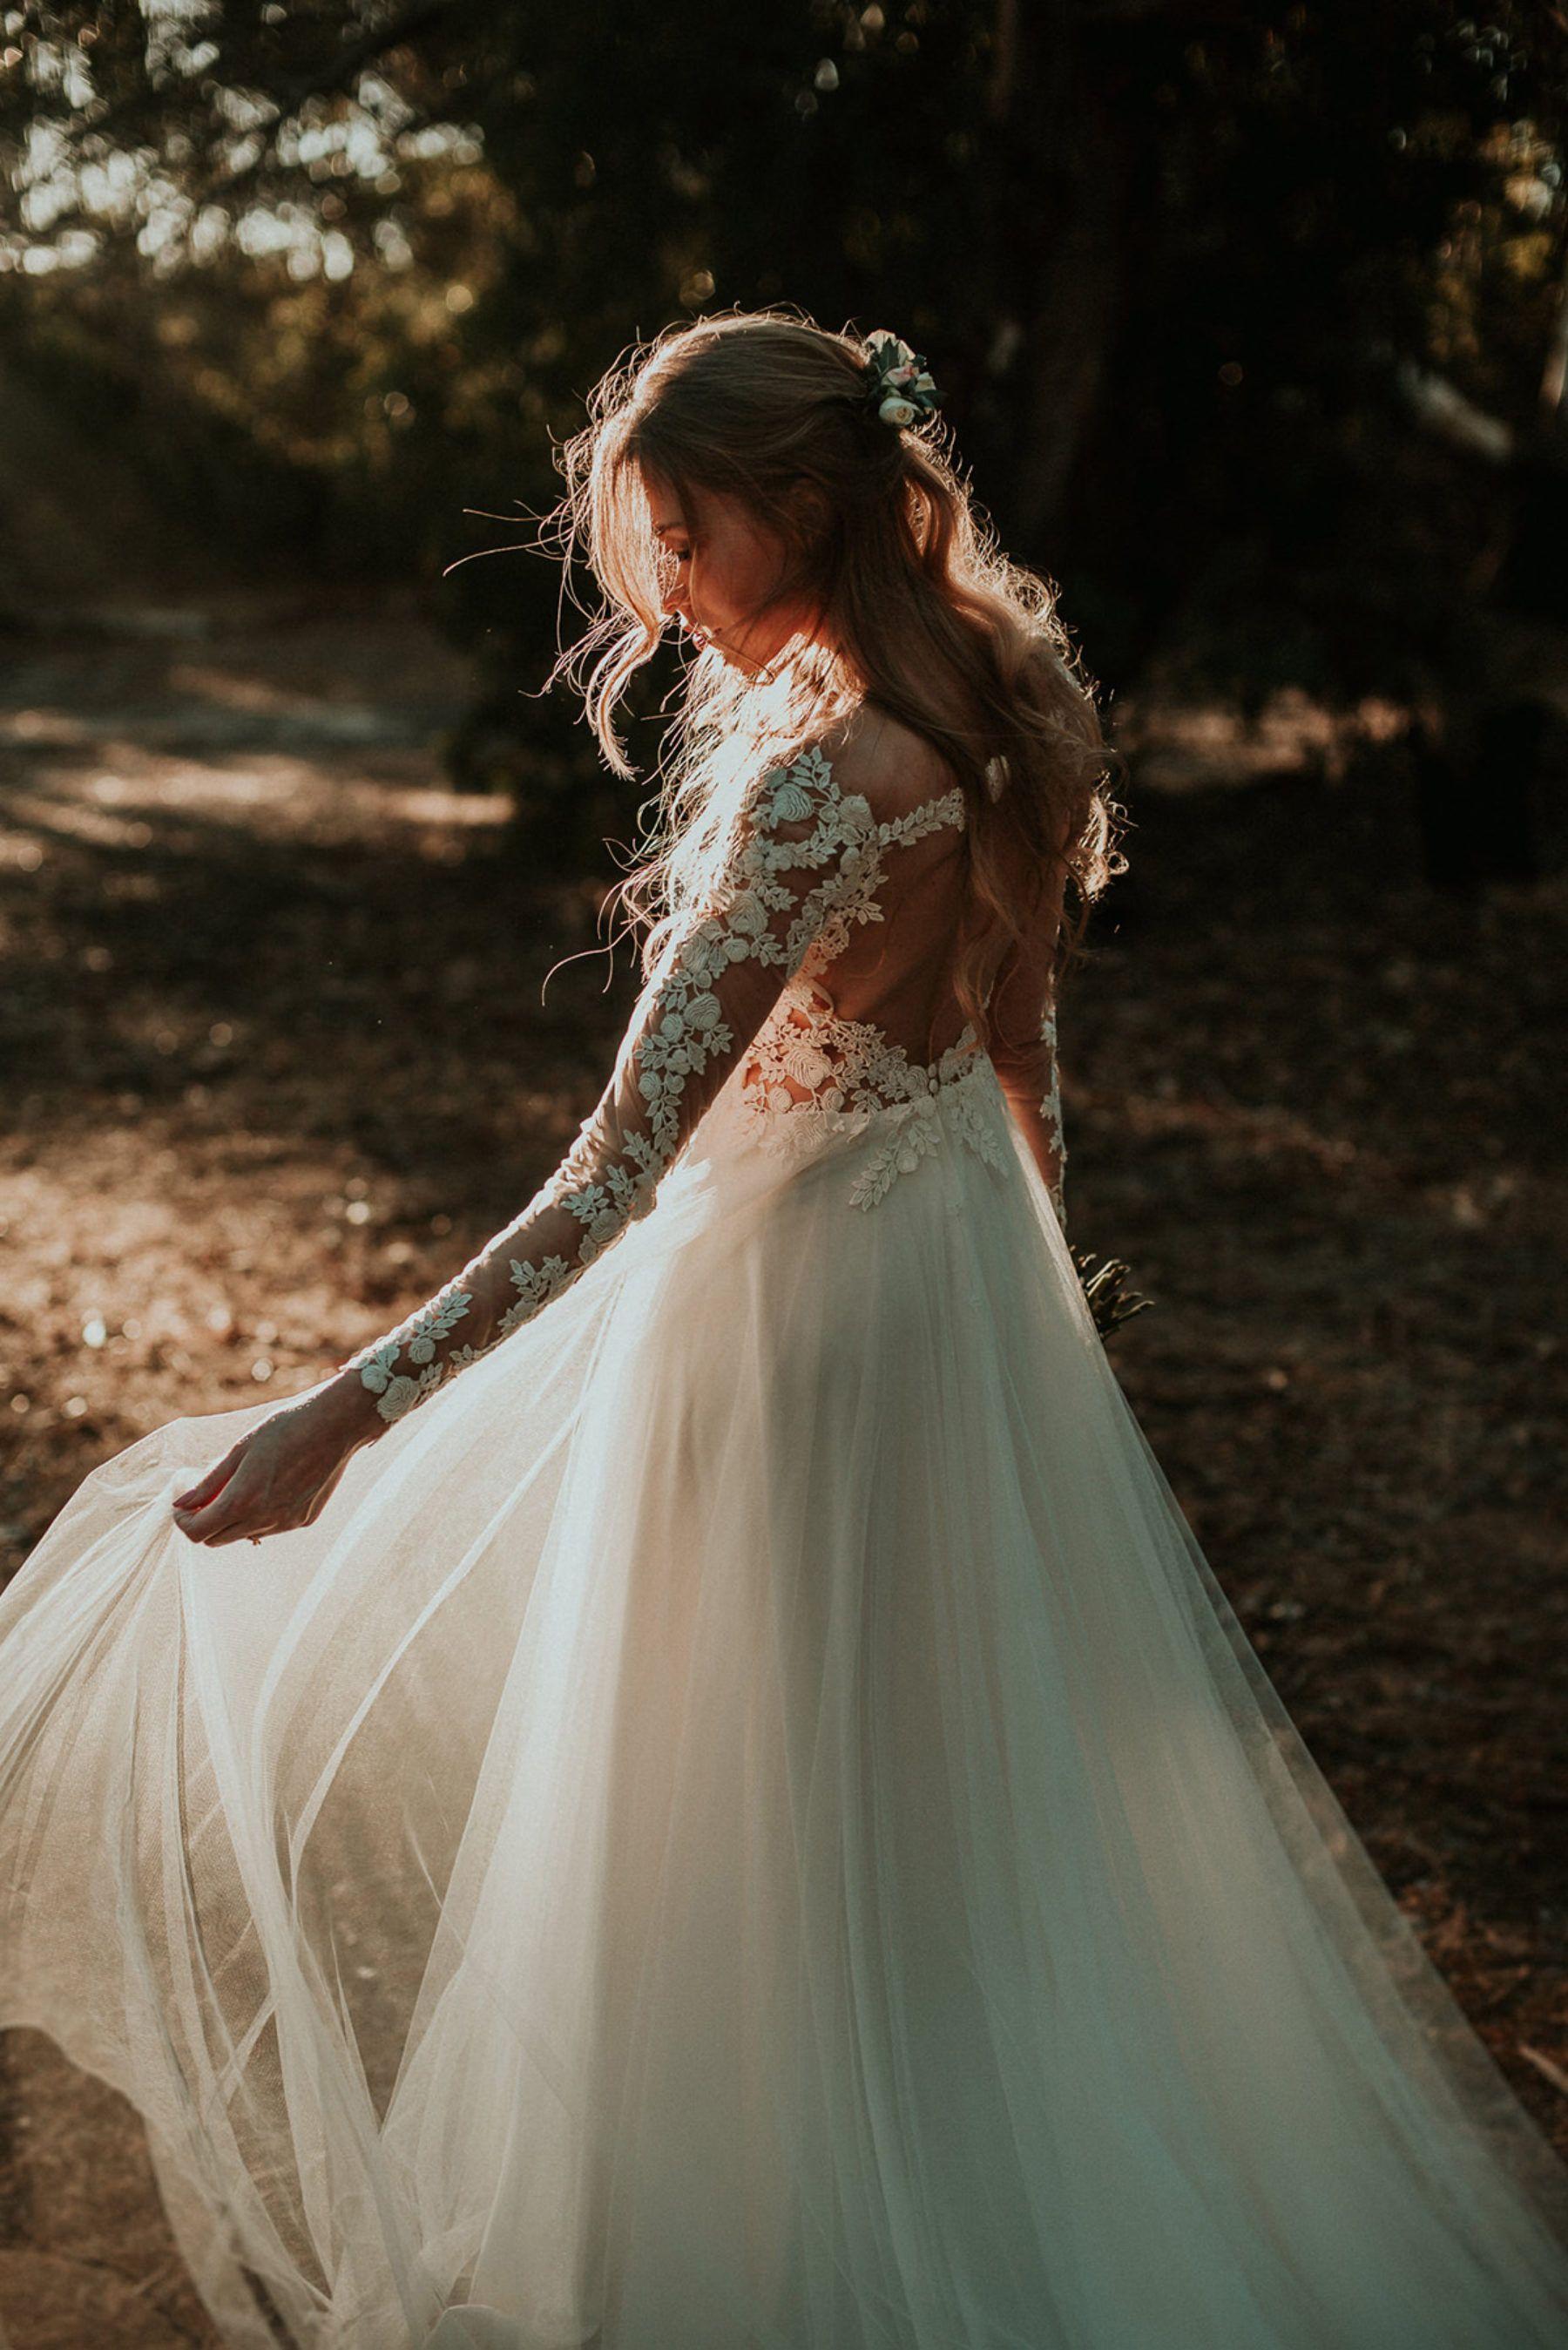 Nature wedding dress  Shannon Stent  natural wedding photographer Margaret River  Bride